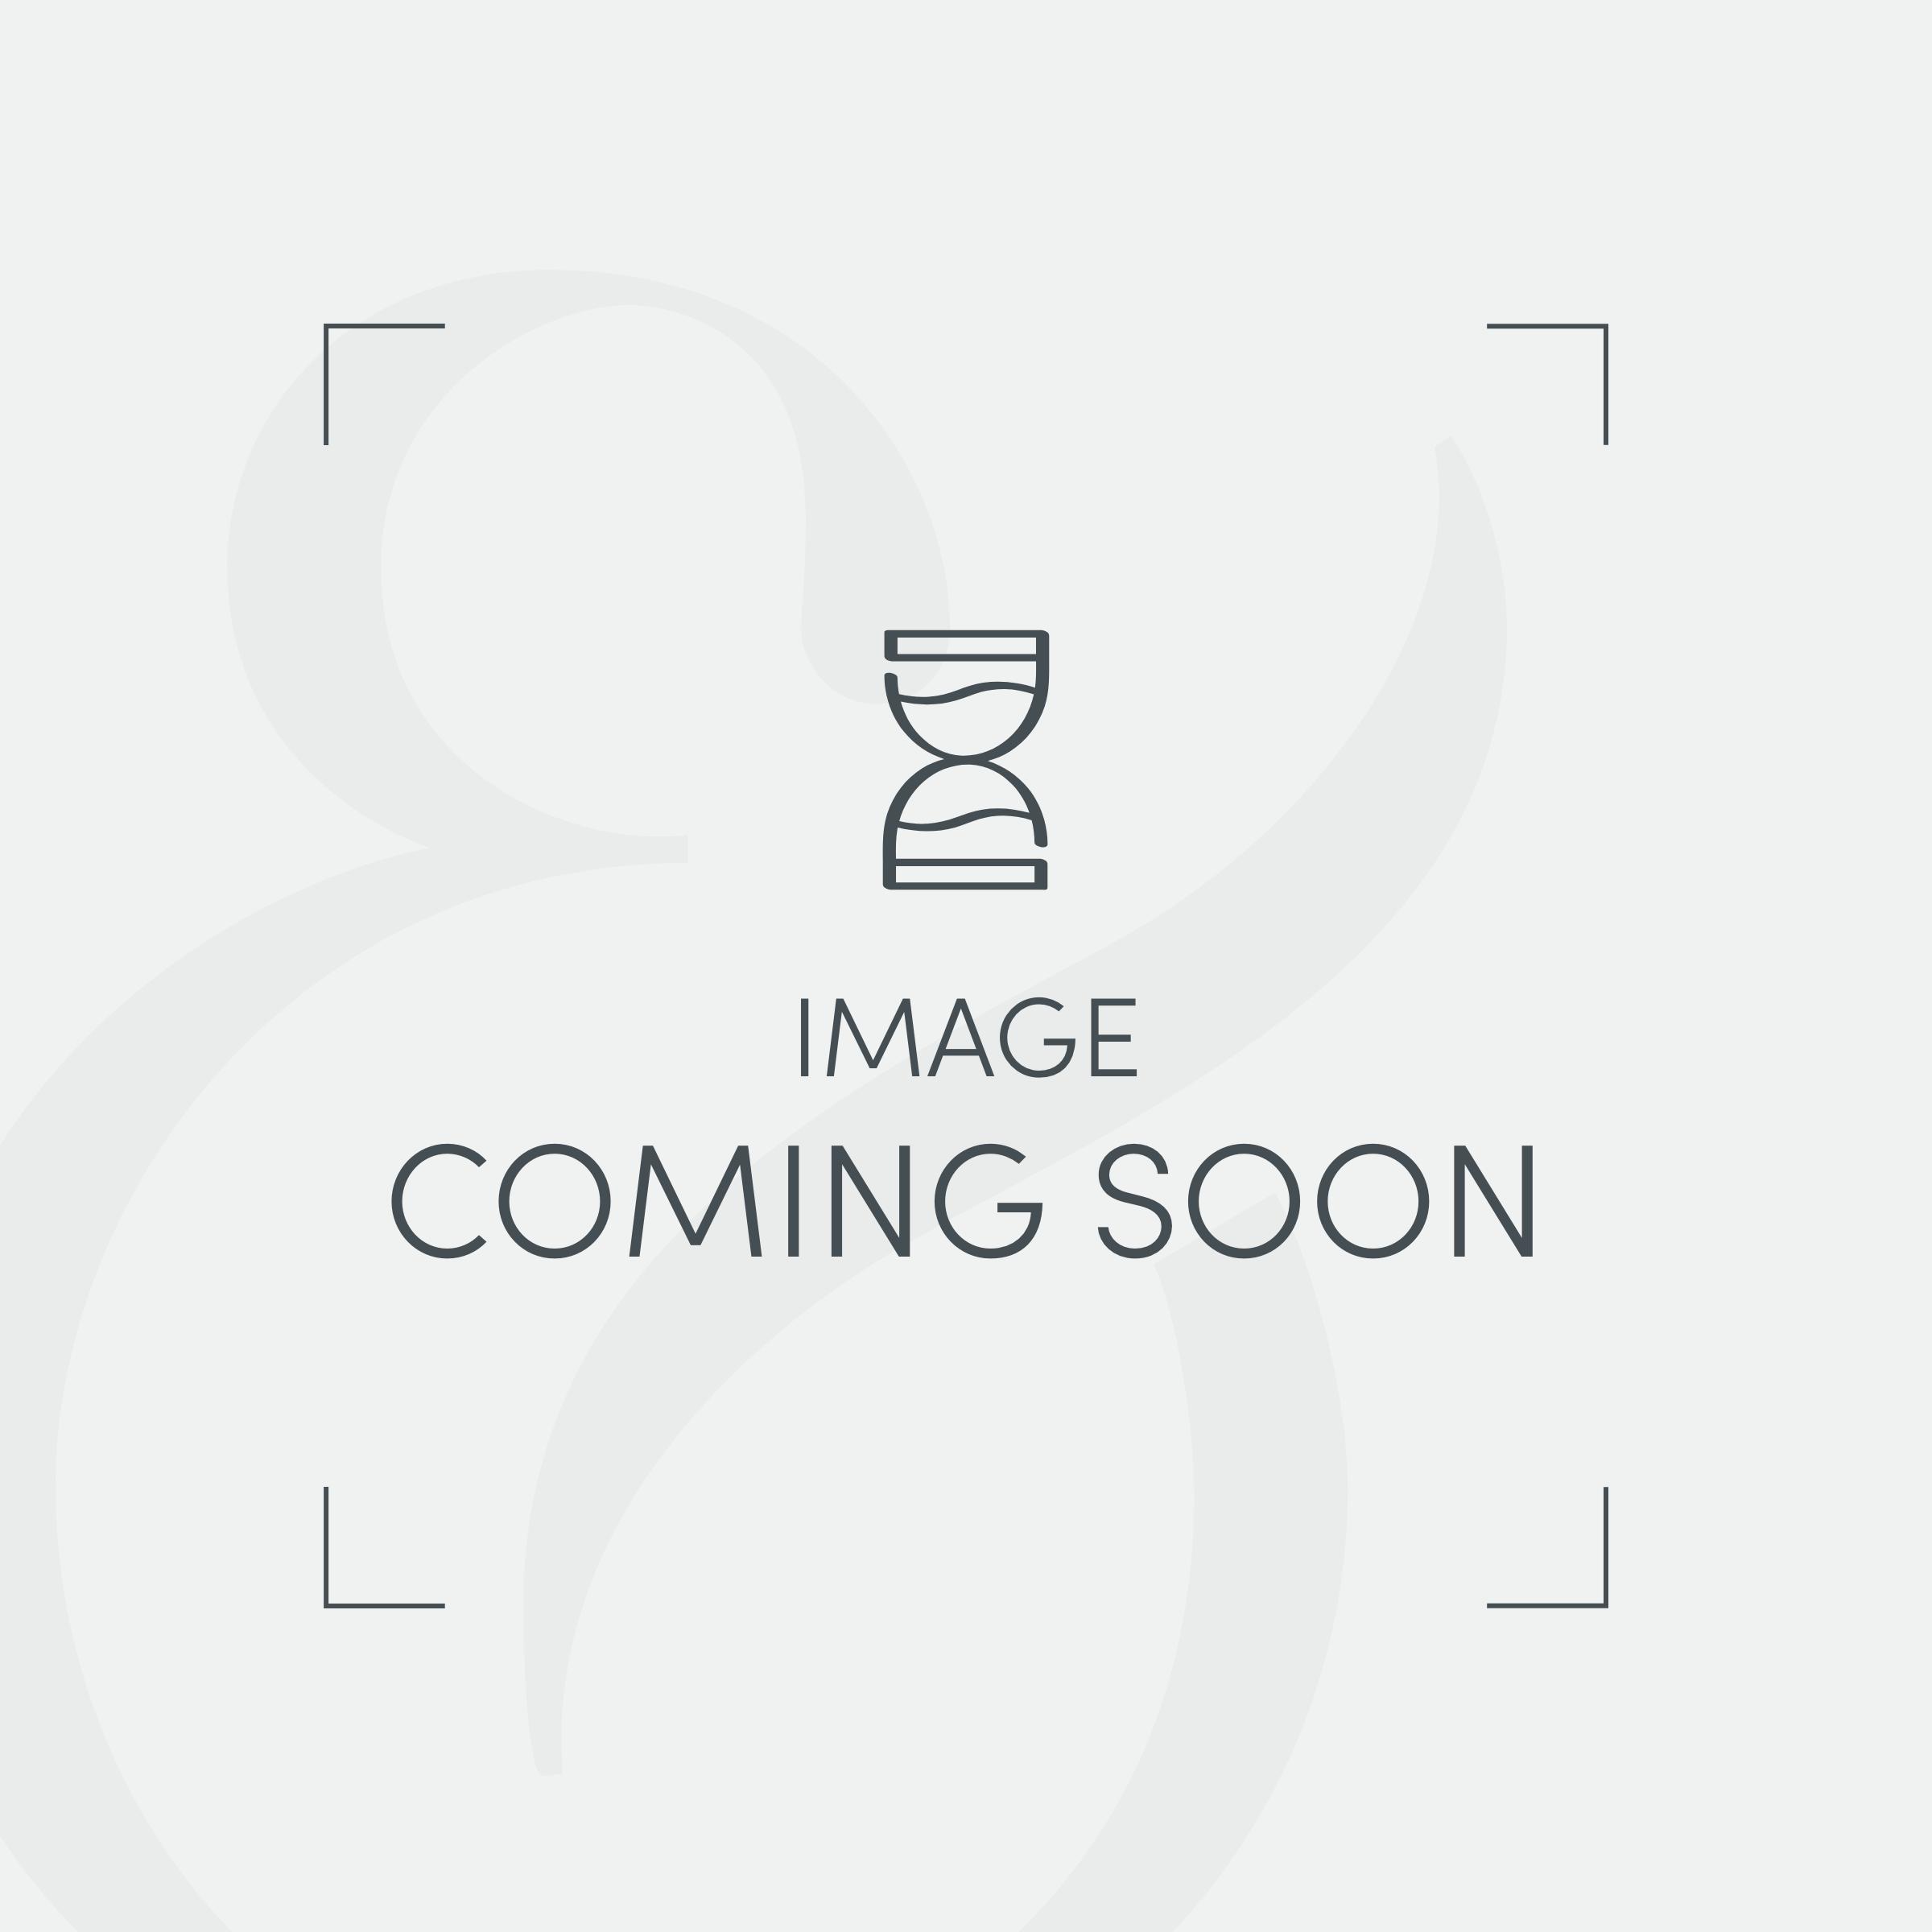 Luxury 600TC Egyptian Cotton Bundle - Dark Grey - King (Duvet Cover, Deep Fitted Sheet, Standard Oxford Pillowcase Pair)